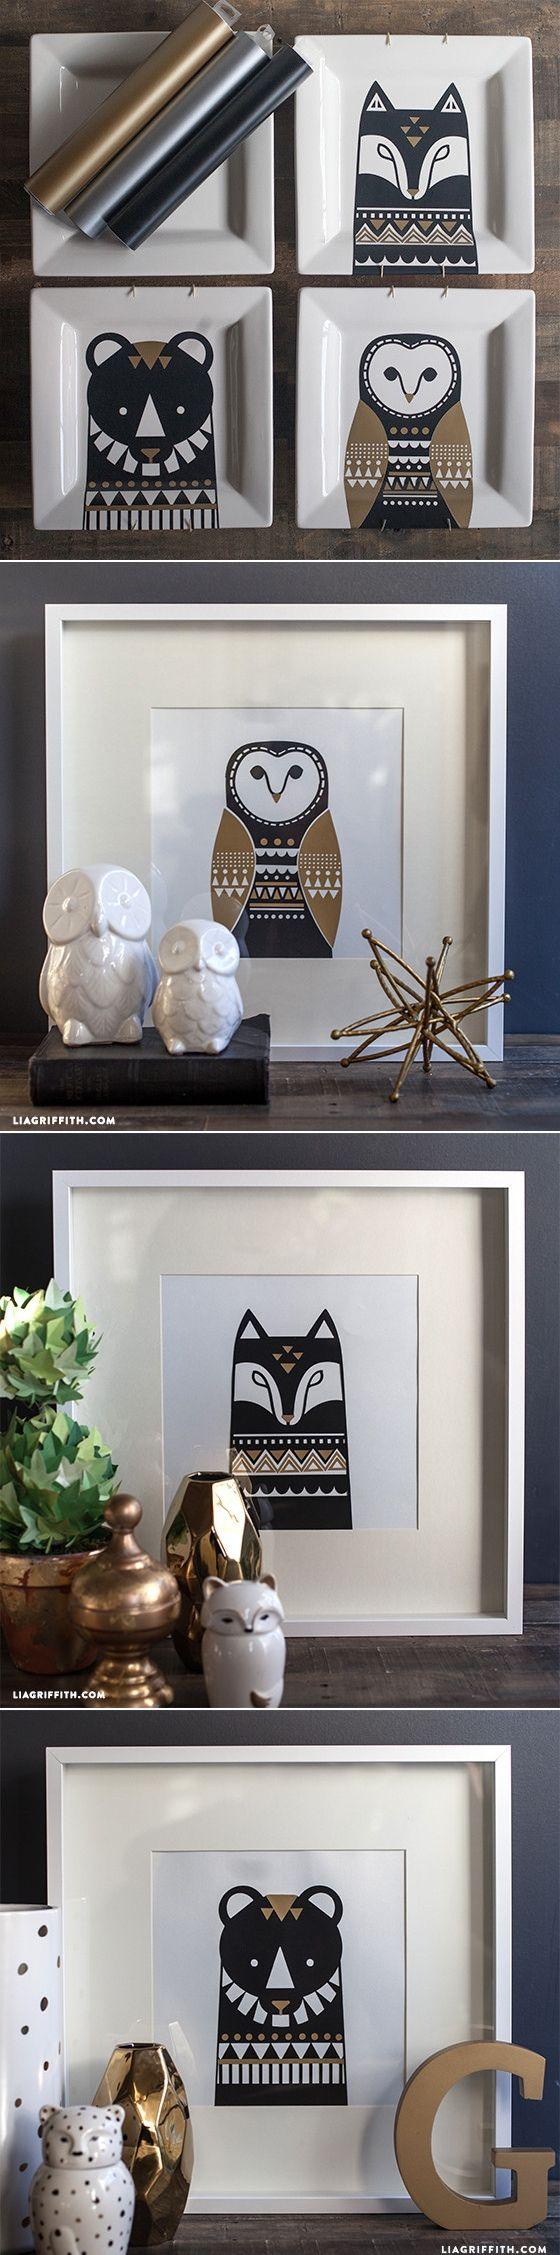 #Scandinavian Inspired Art at www.LiaGriffith.com